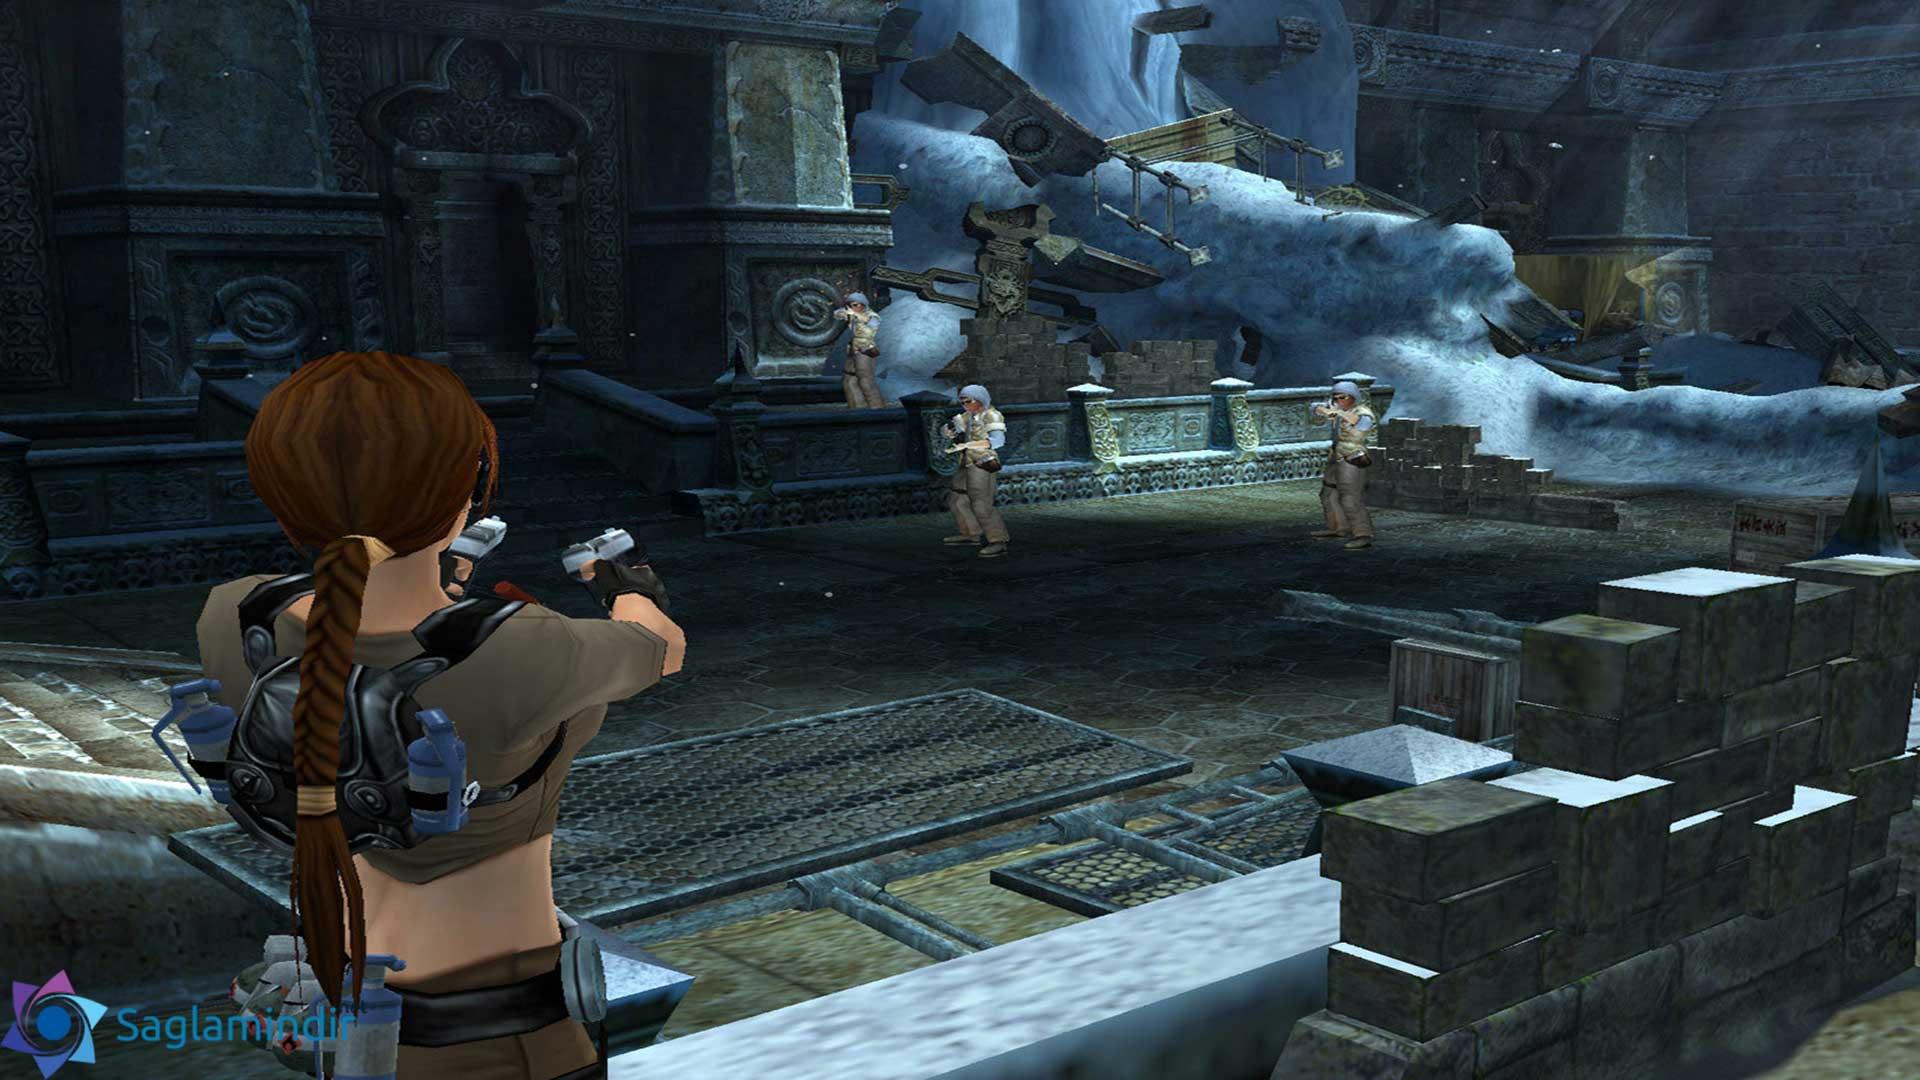 Tomb Raider Legend saglamindir